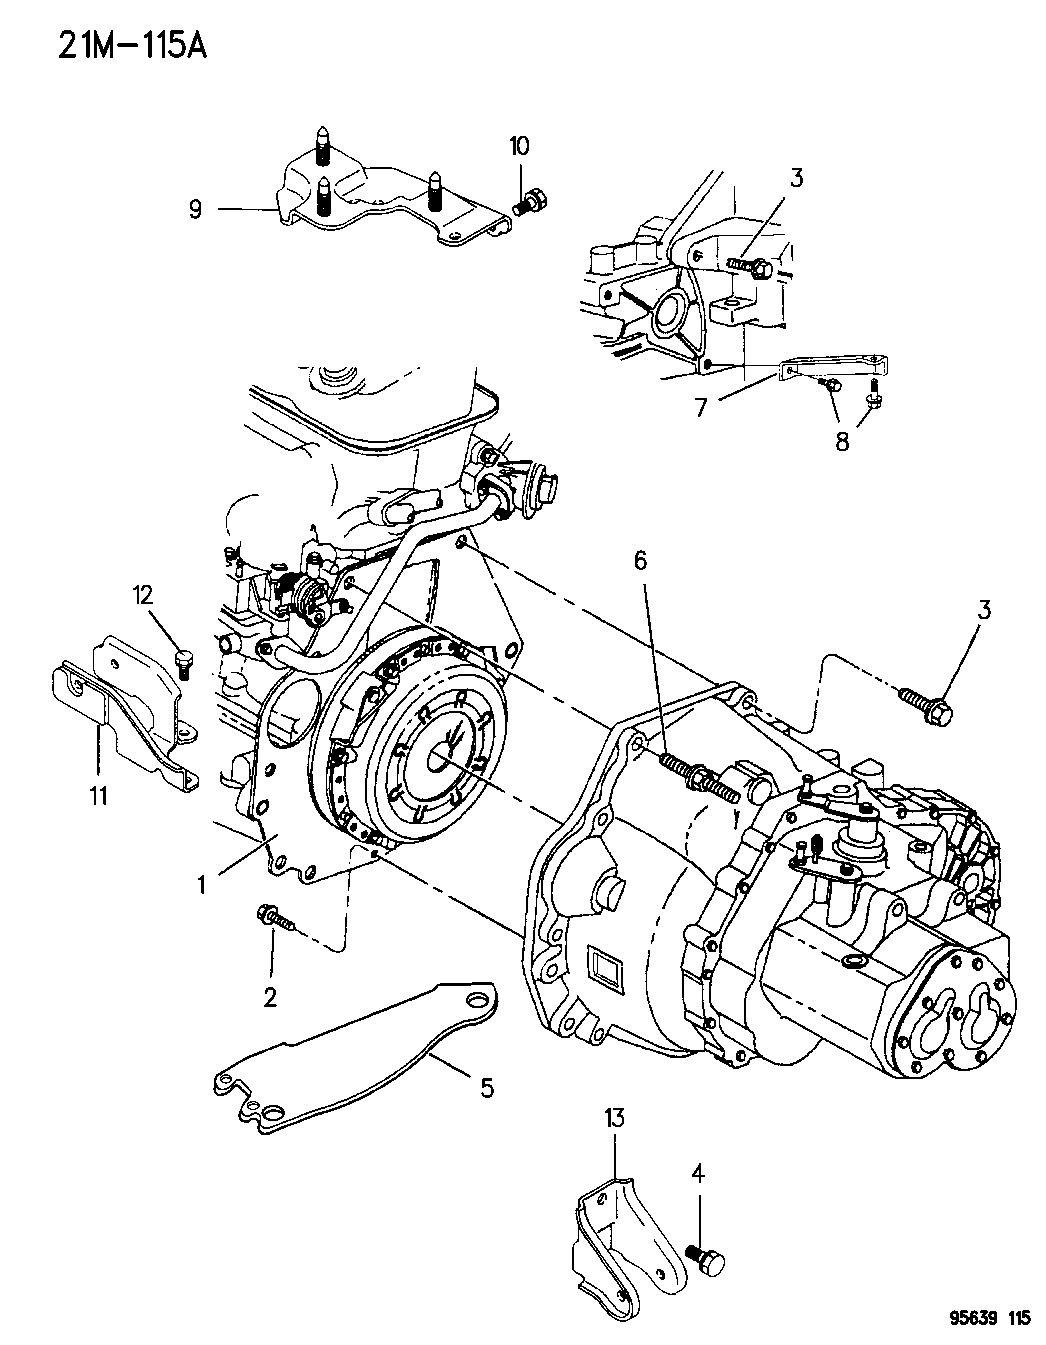 1996 Dodge Avenger Transaxle Mounting Mopar Parts Giant Engine Diagram